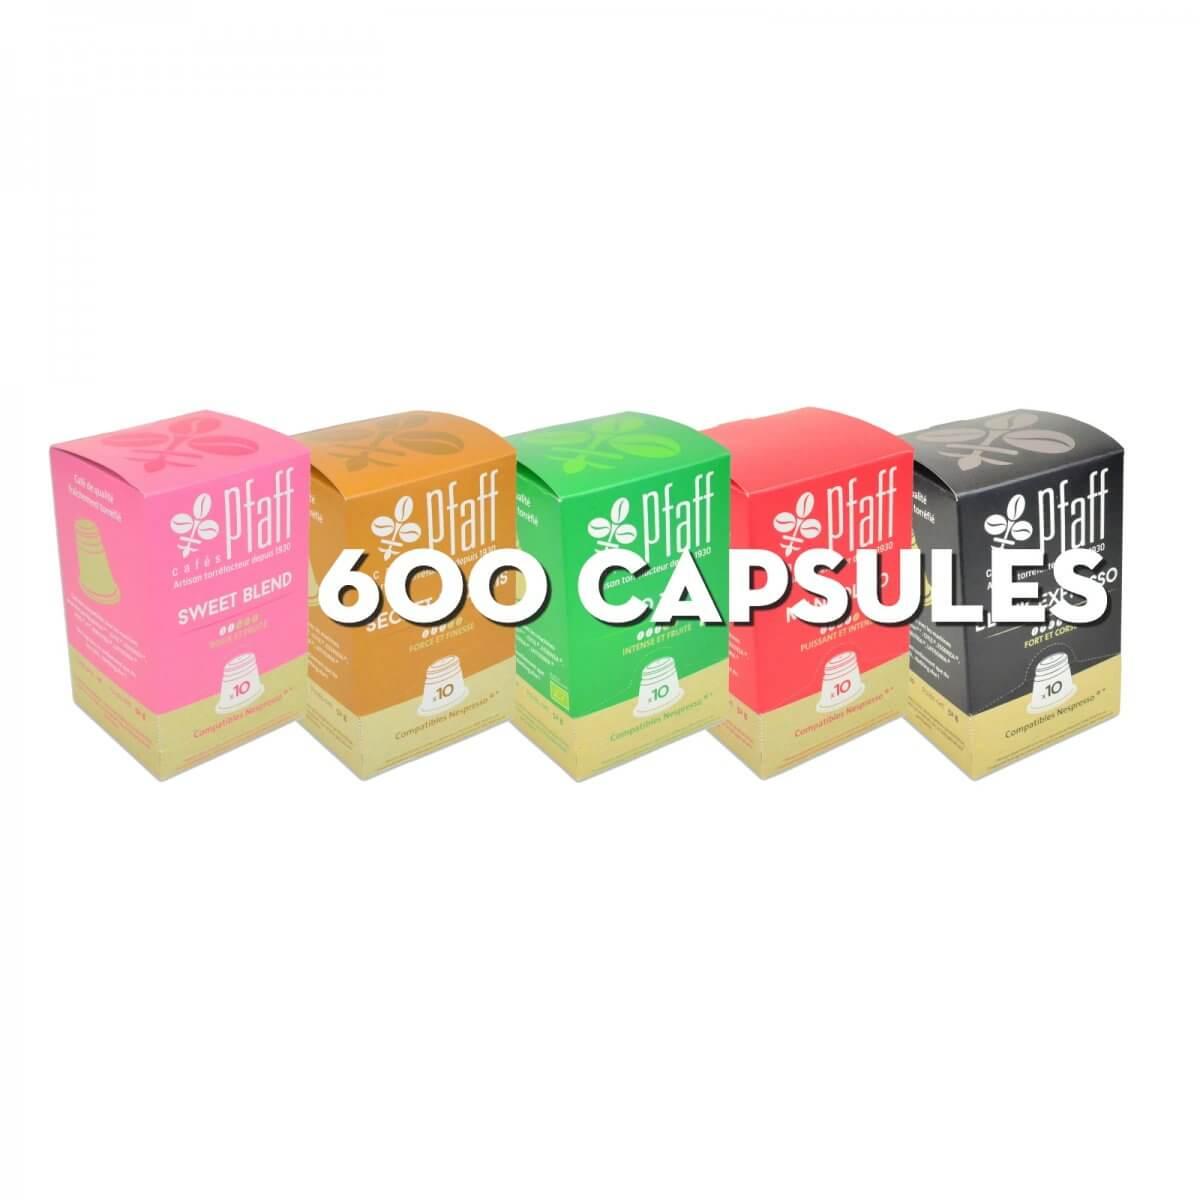 assortiment 600 capsules nescompatibles cafes pfaff 2016